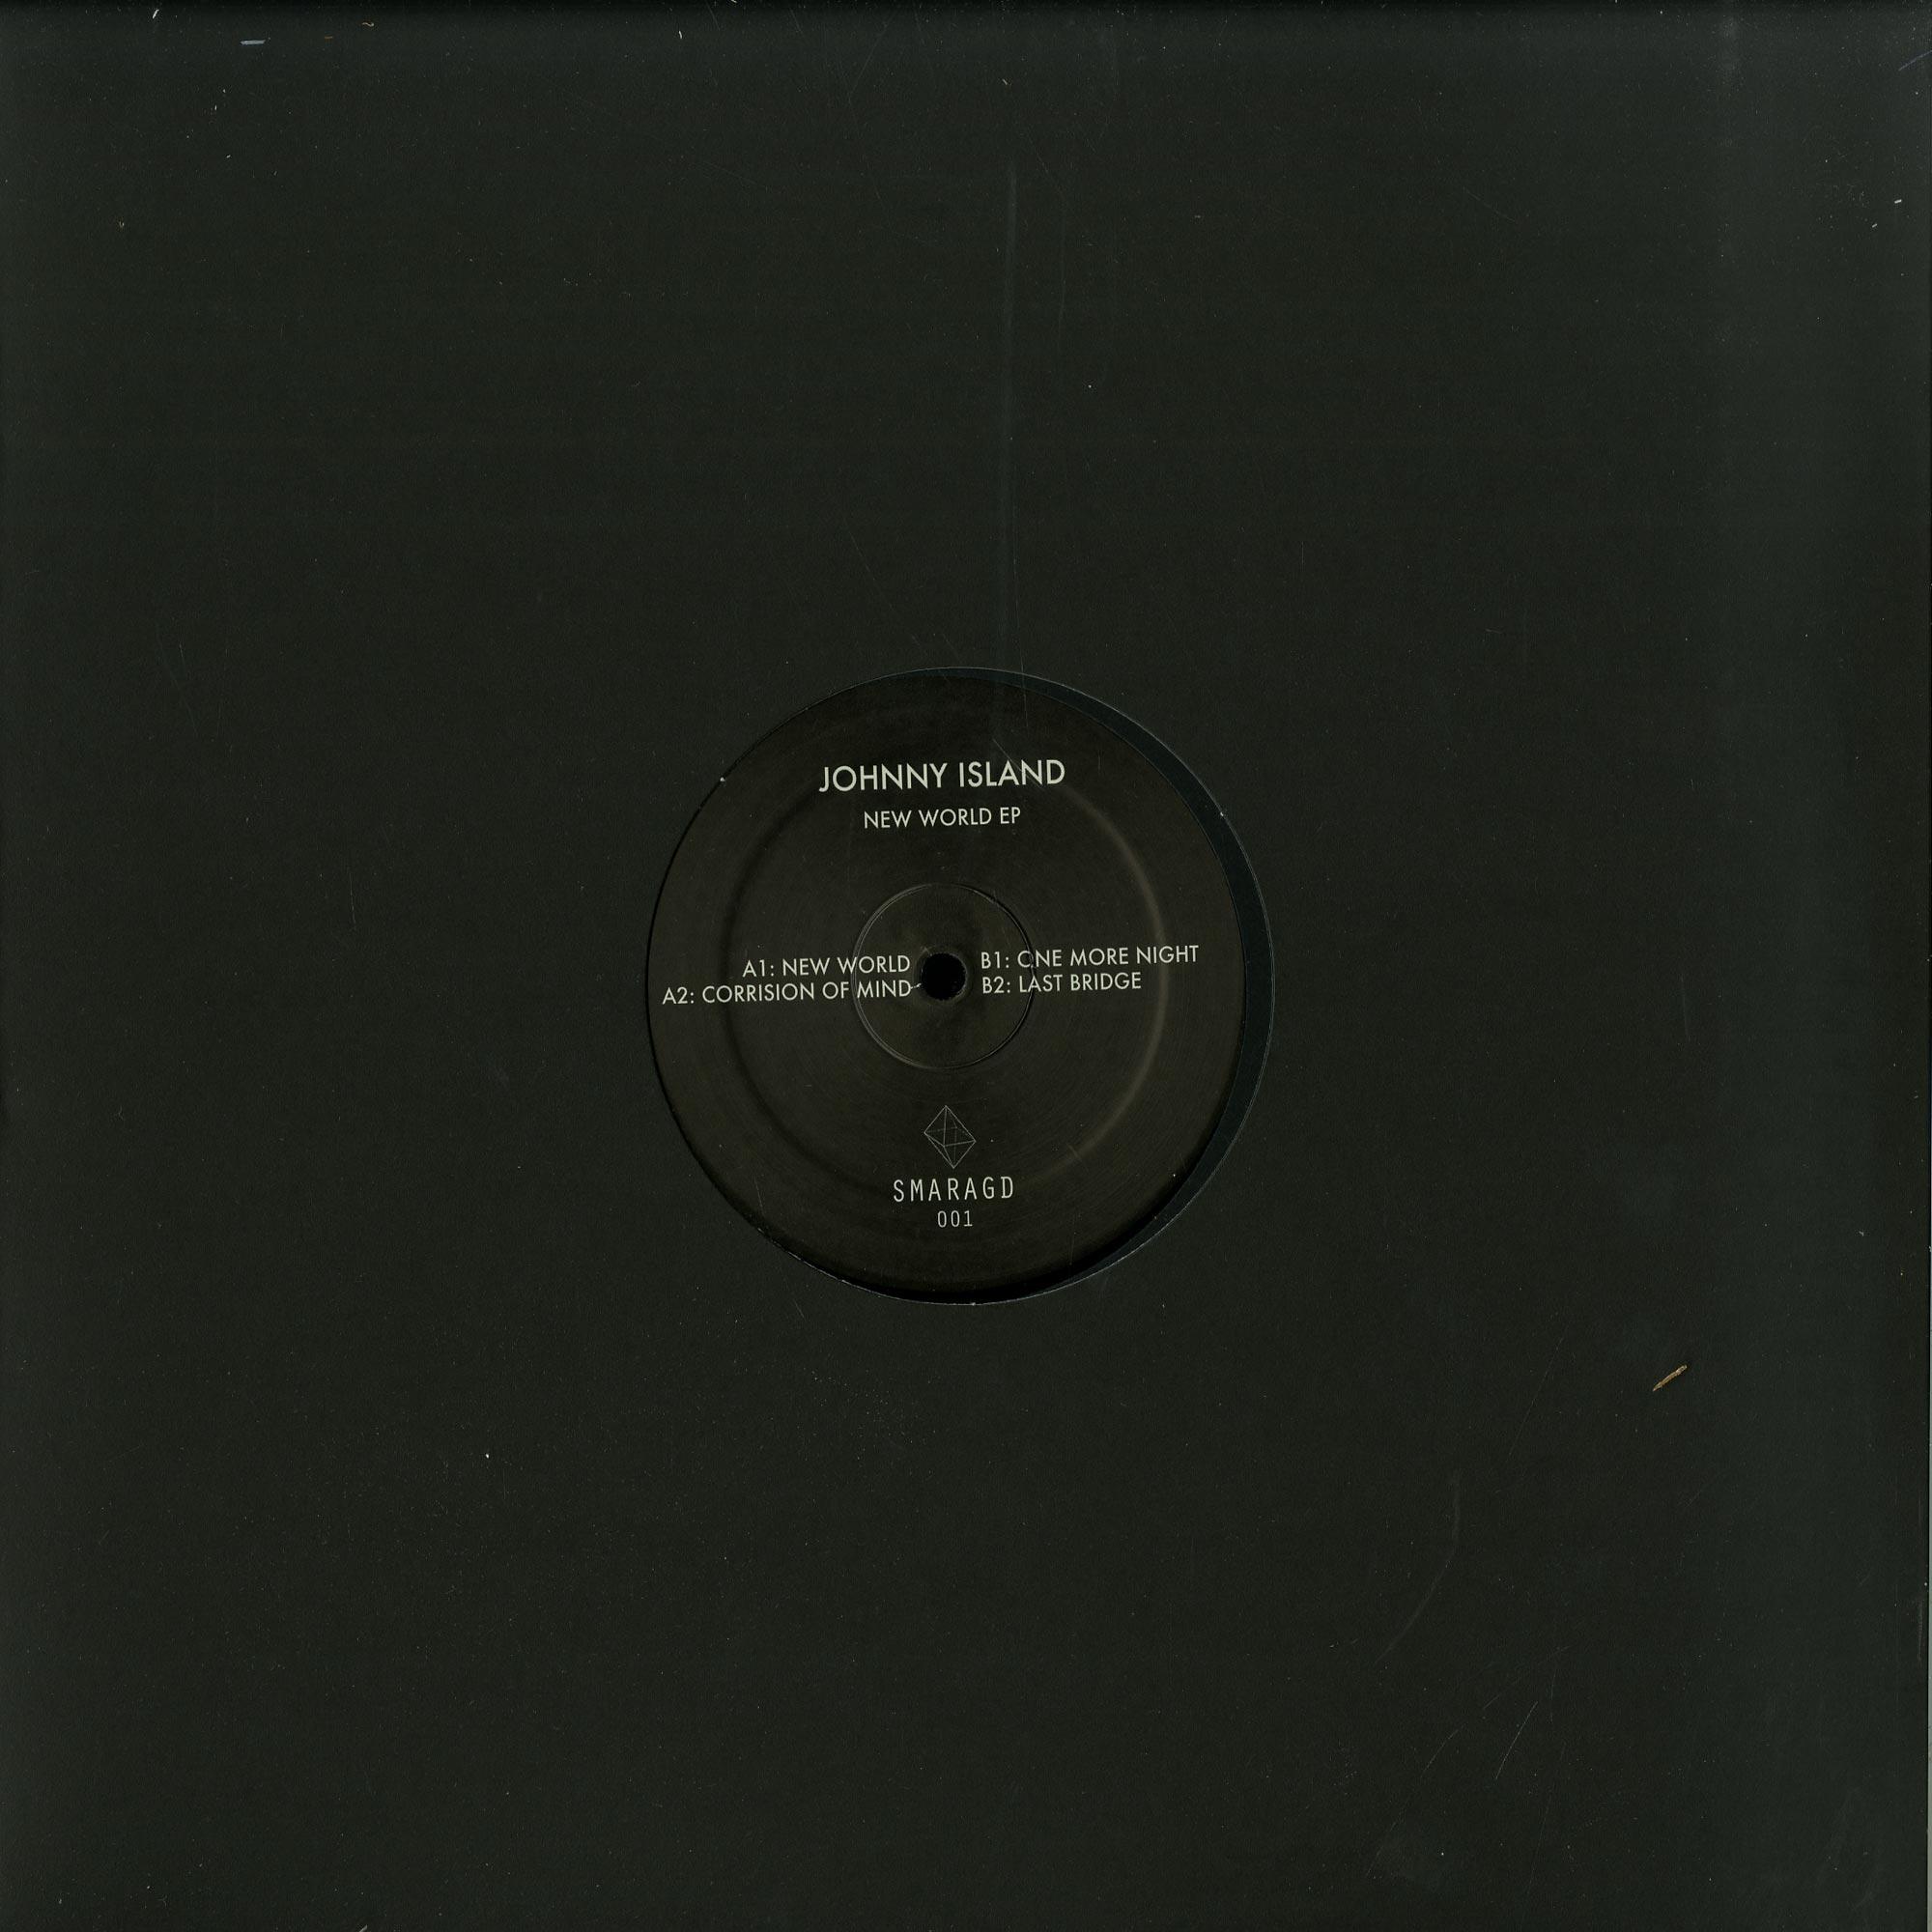 Johnny Island - NEW WORLD EP